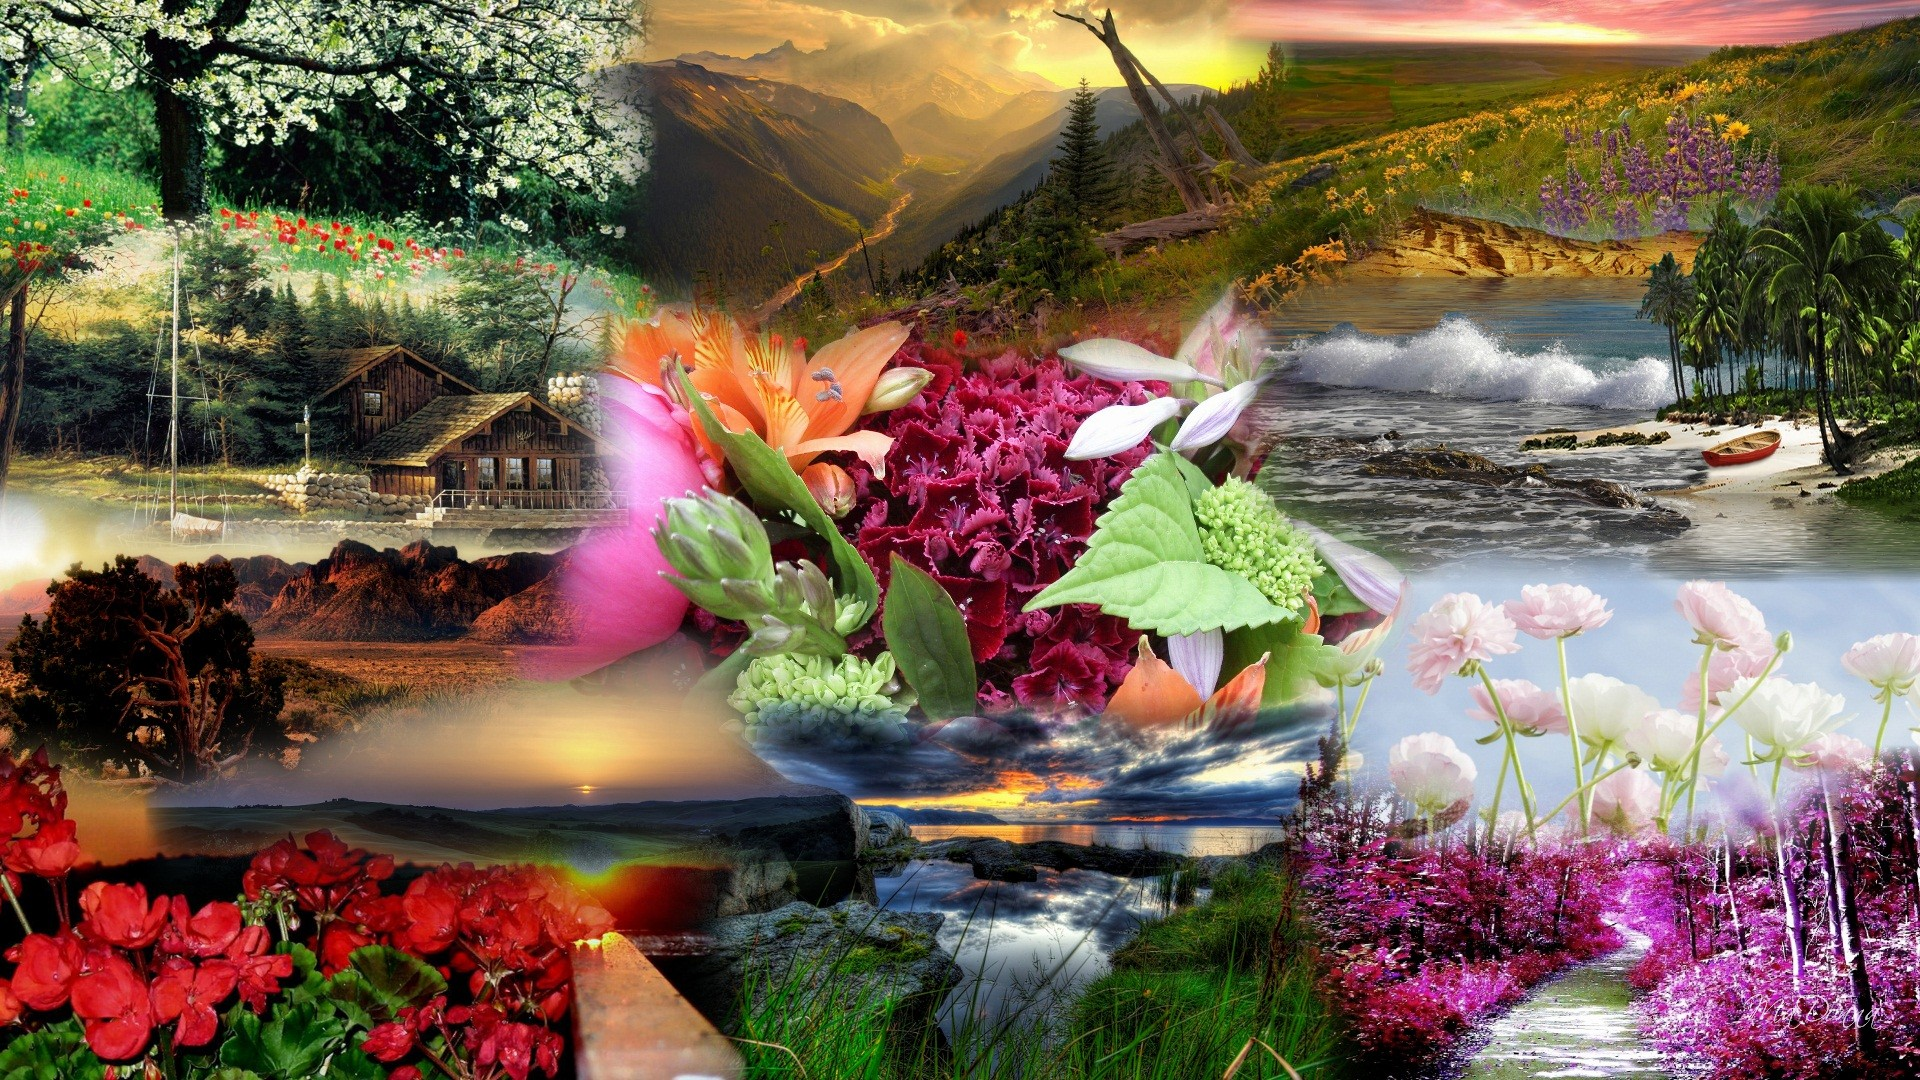 Nature Beautiful Wallpaper Background 1920x1080 Download Hd Wallpaper Wallpapertip